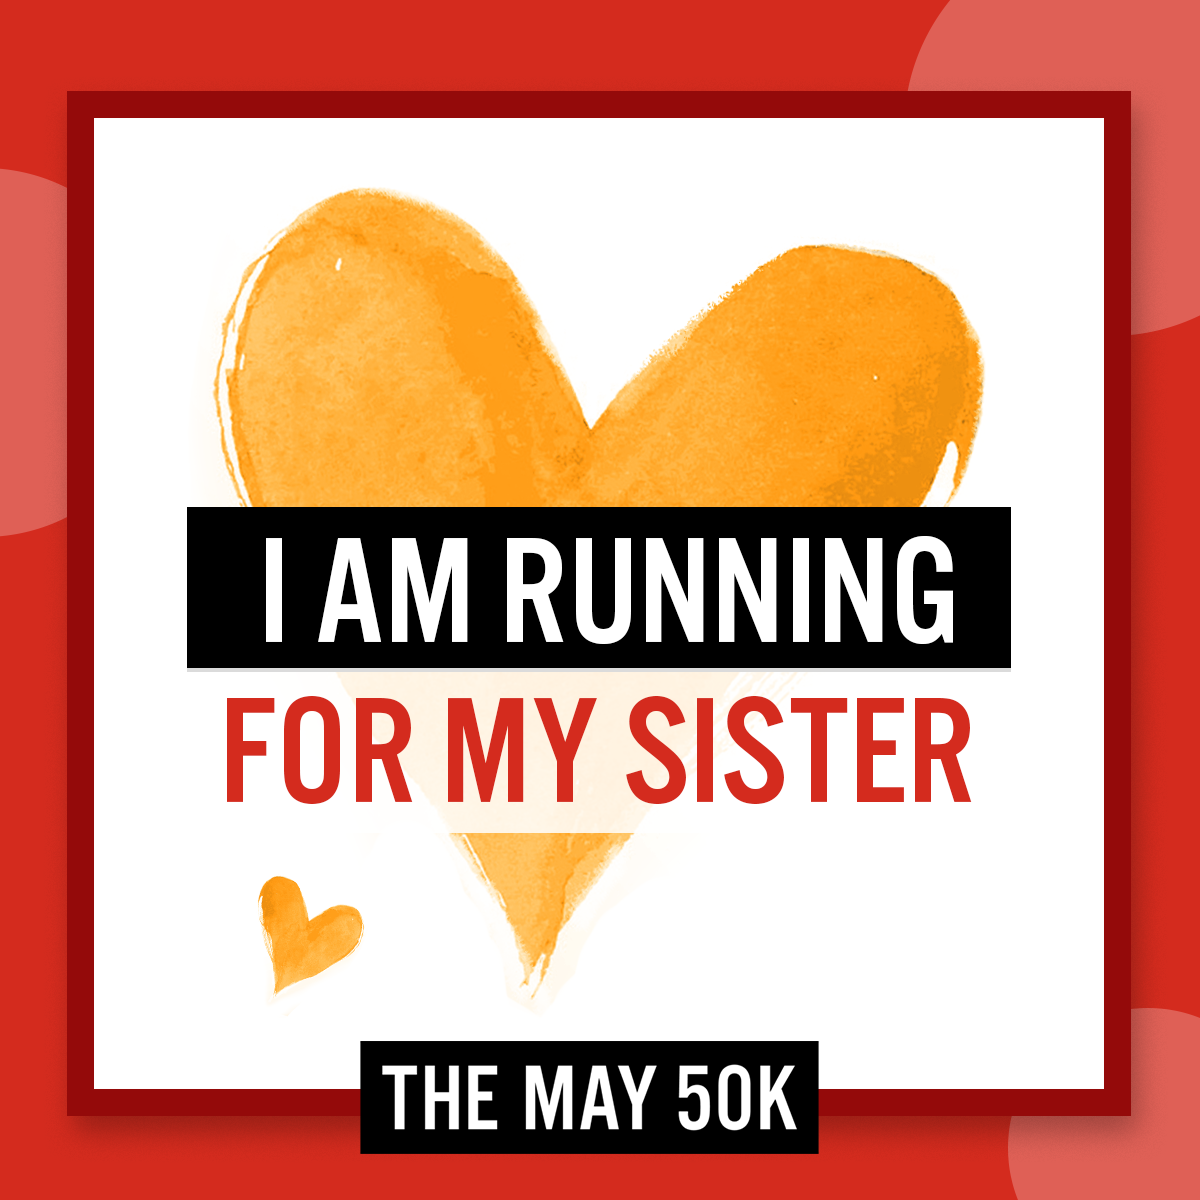 Social Posts - Run For Sister